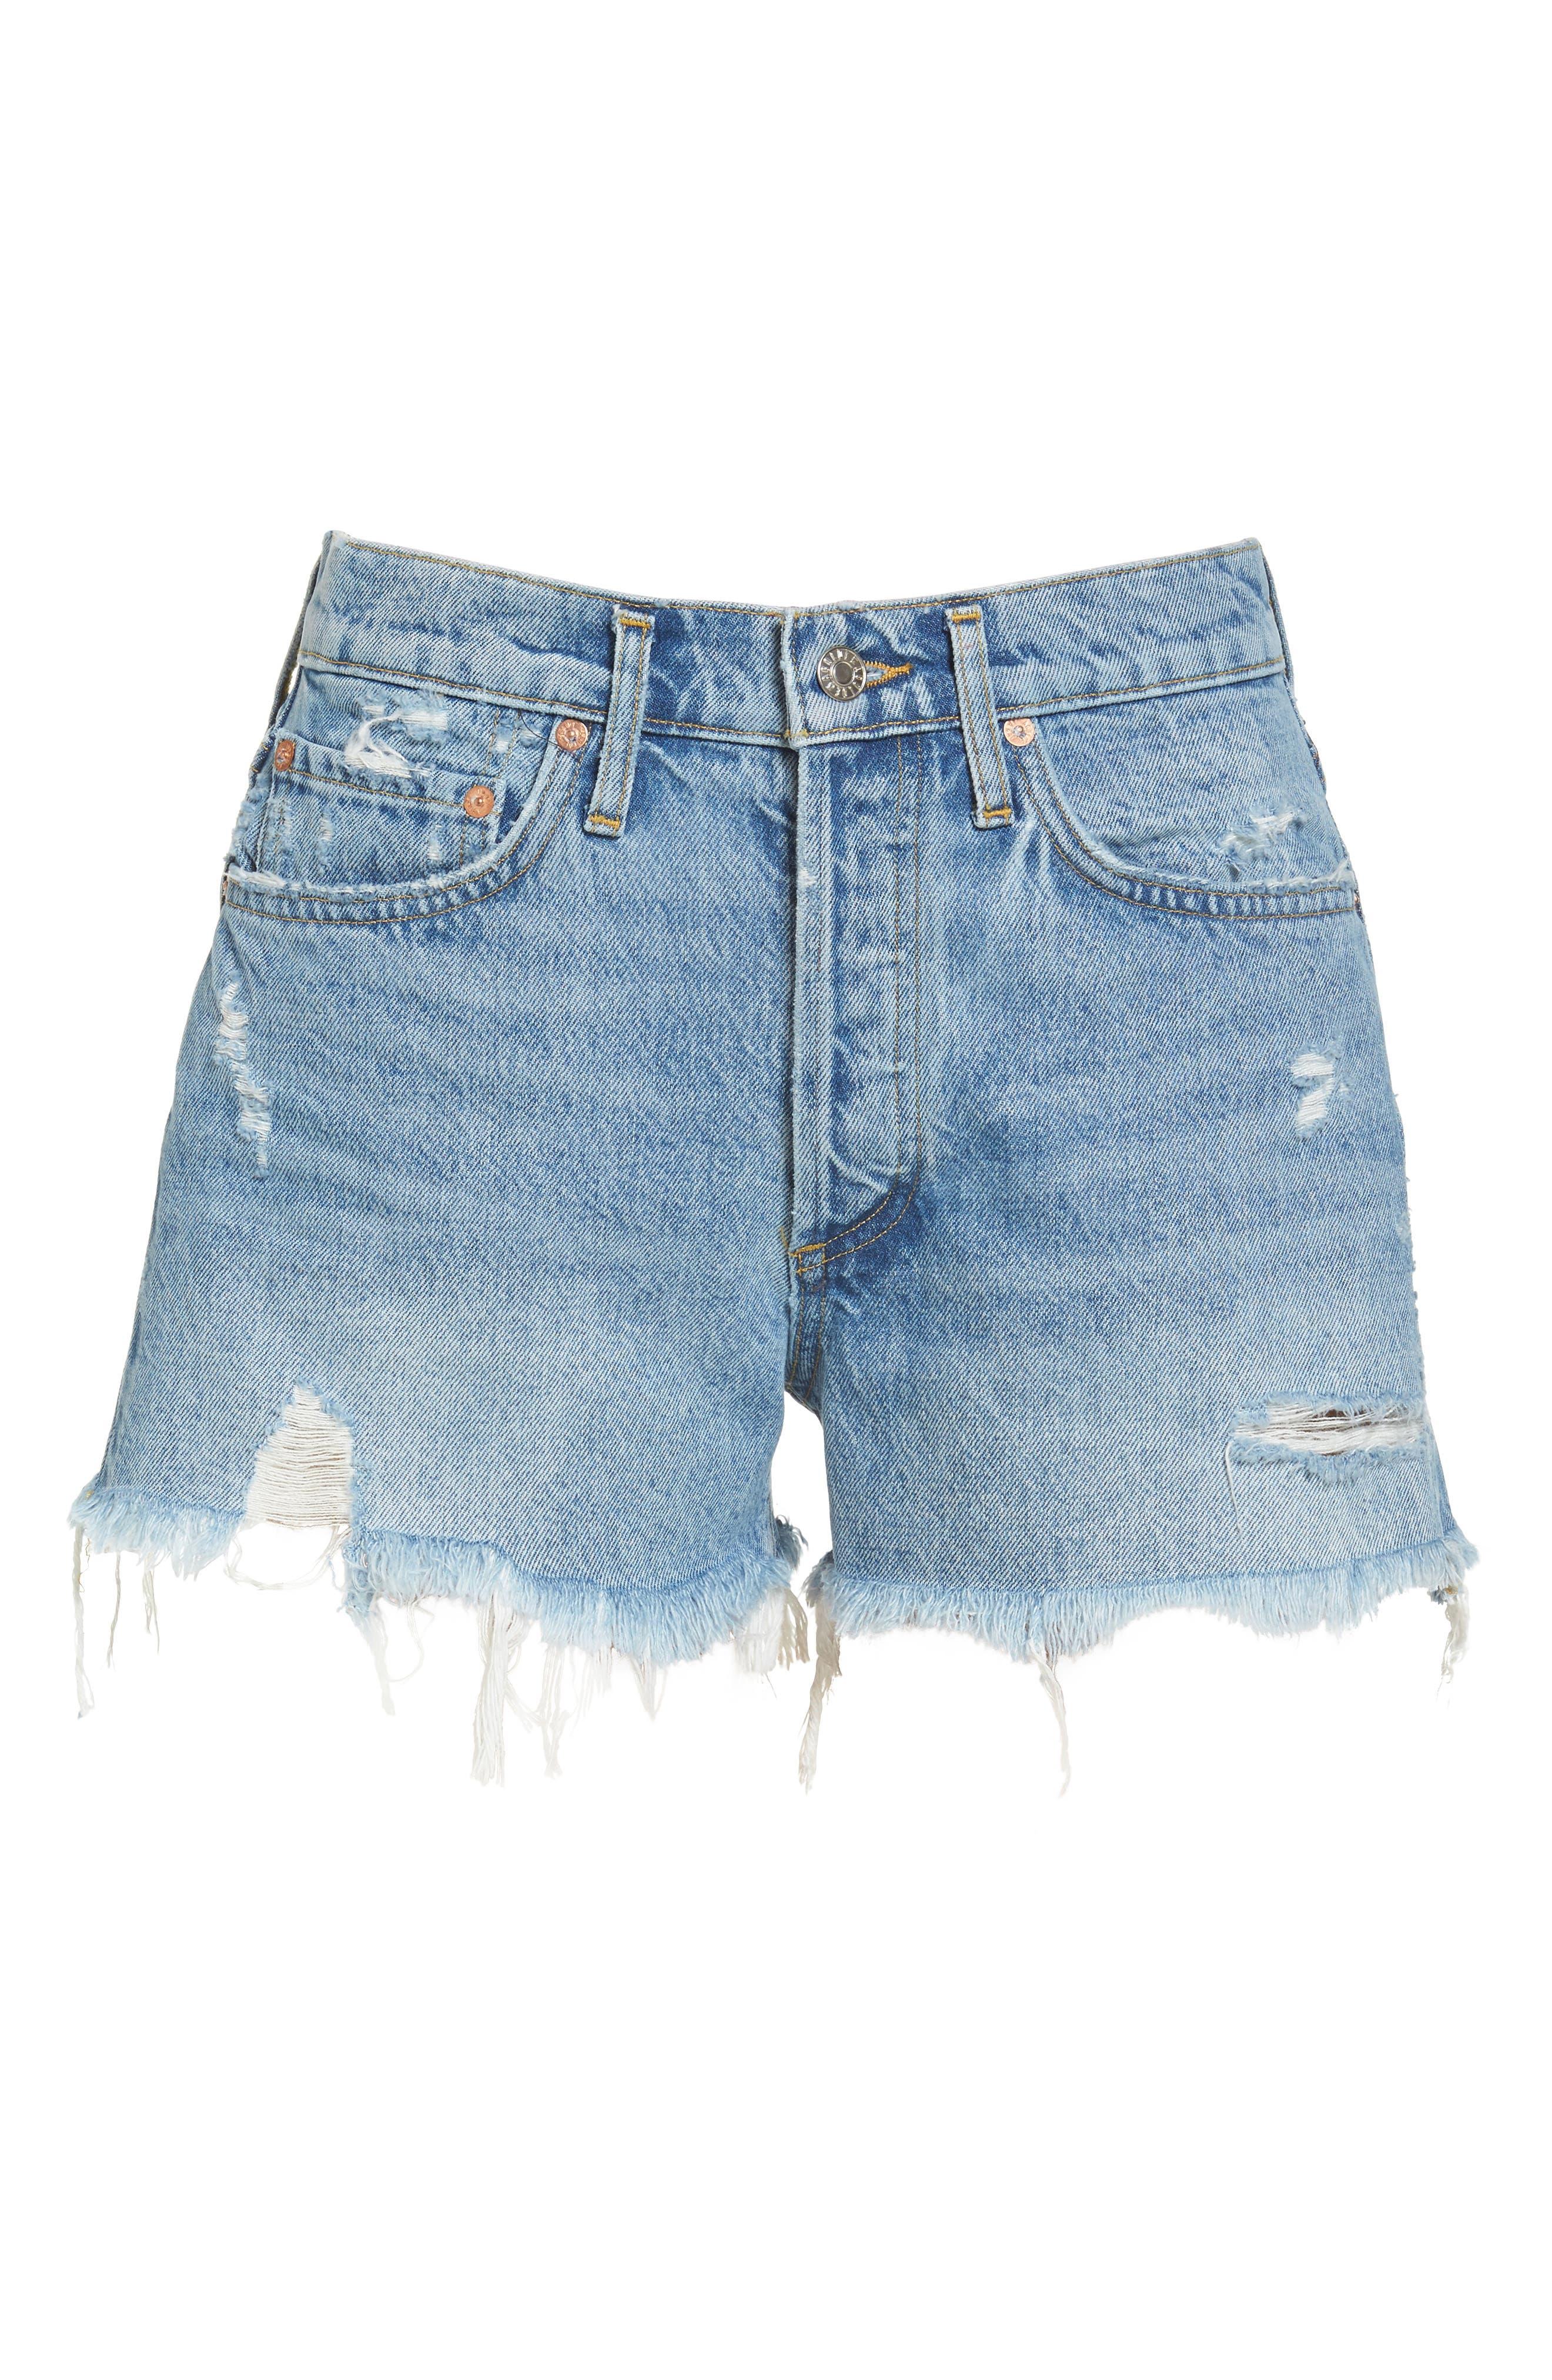 Parker Distressed Denim Shorts,                             Alternate thumbnail 7, color,                             SWAPMEET